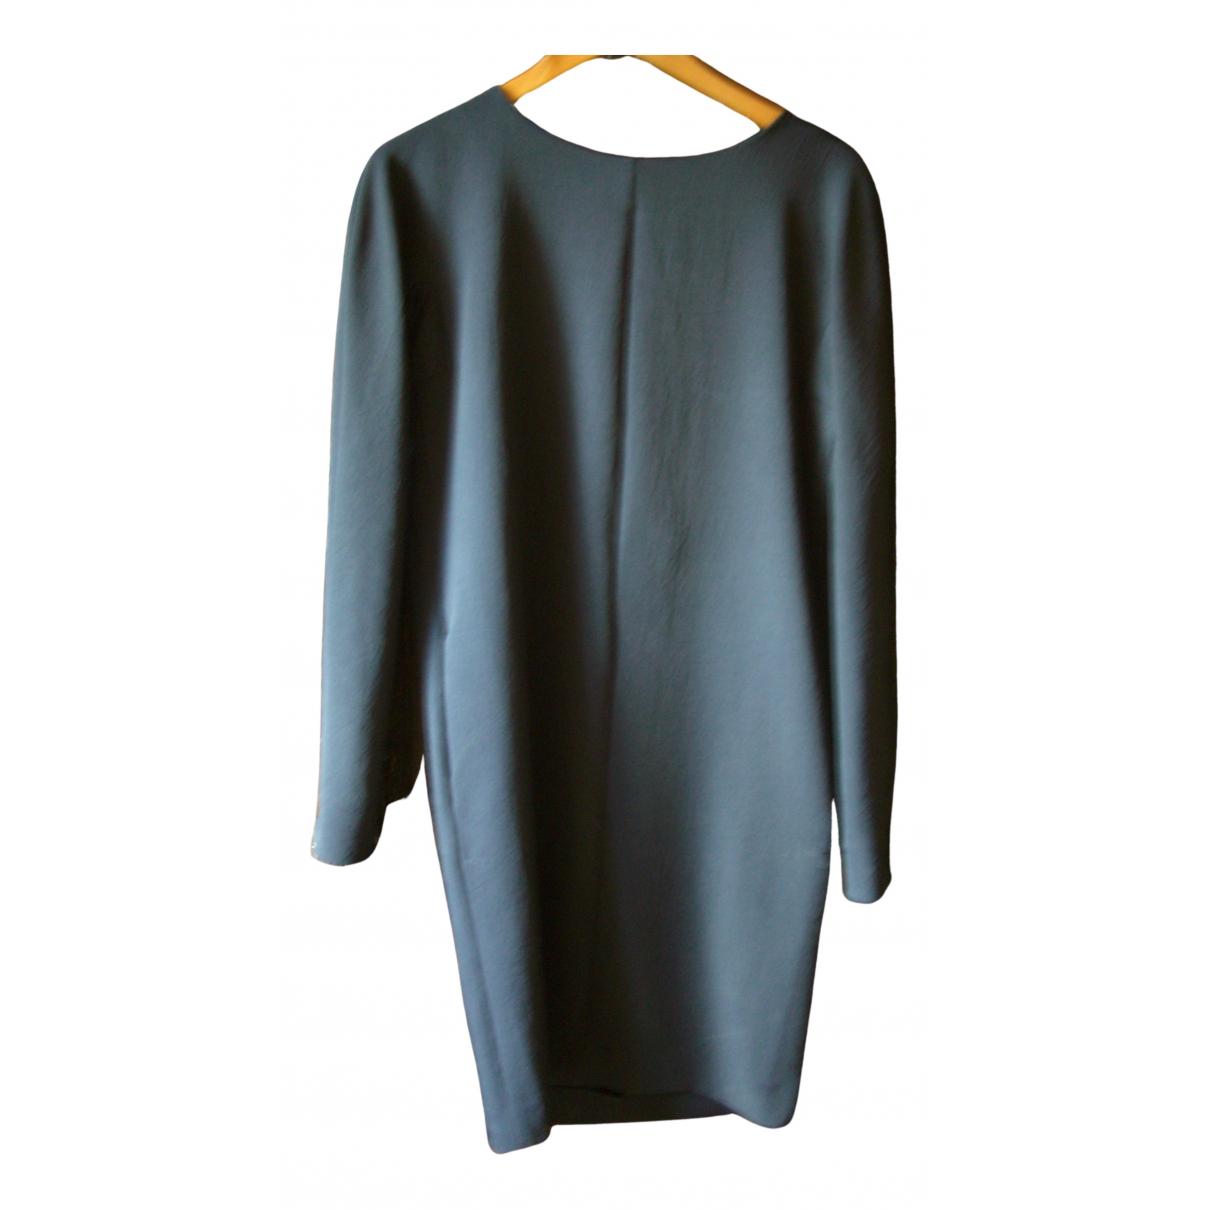 Marni \N Kleid in  Blau Polyester